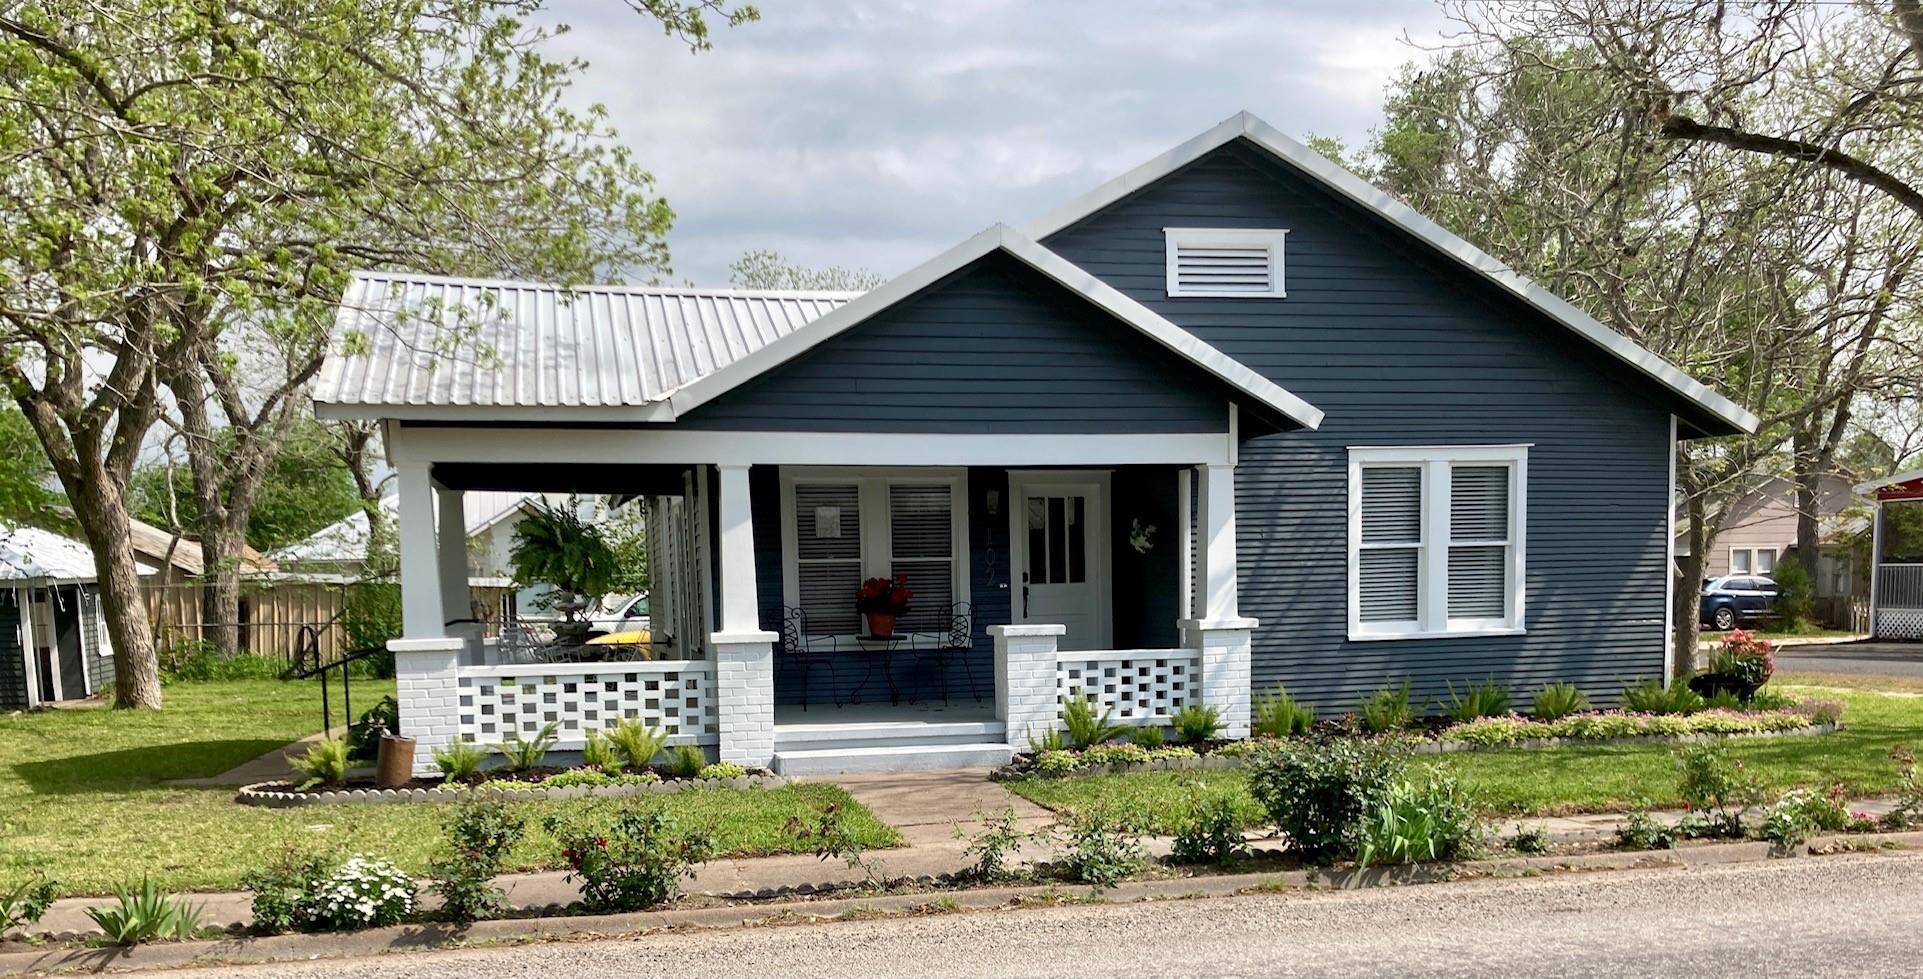 102 E Main Property Photo - Fayetteville, TX real estate listing